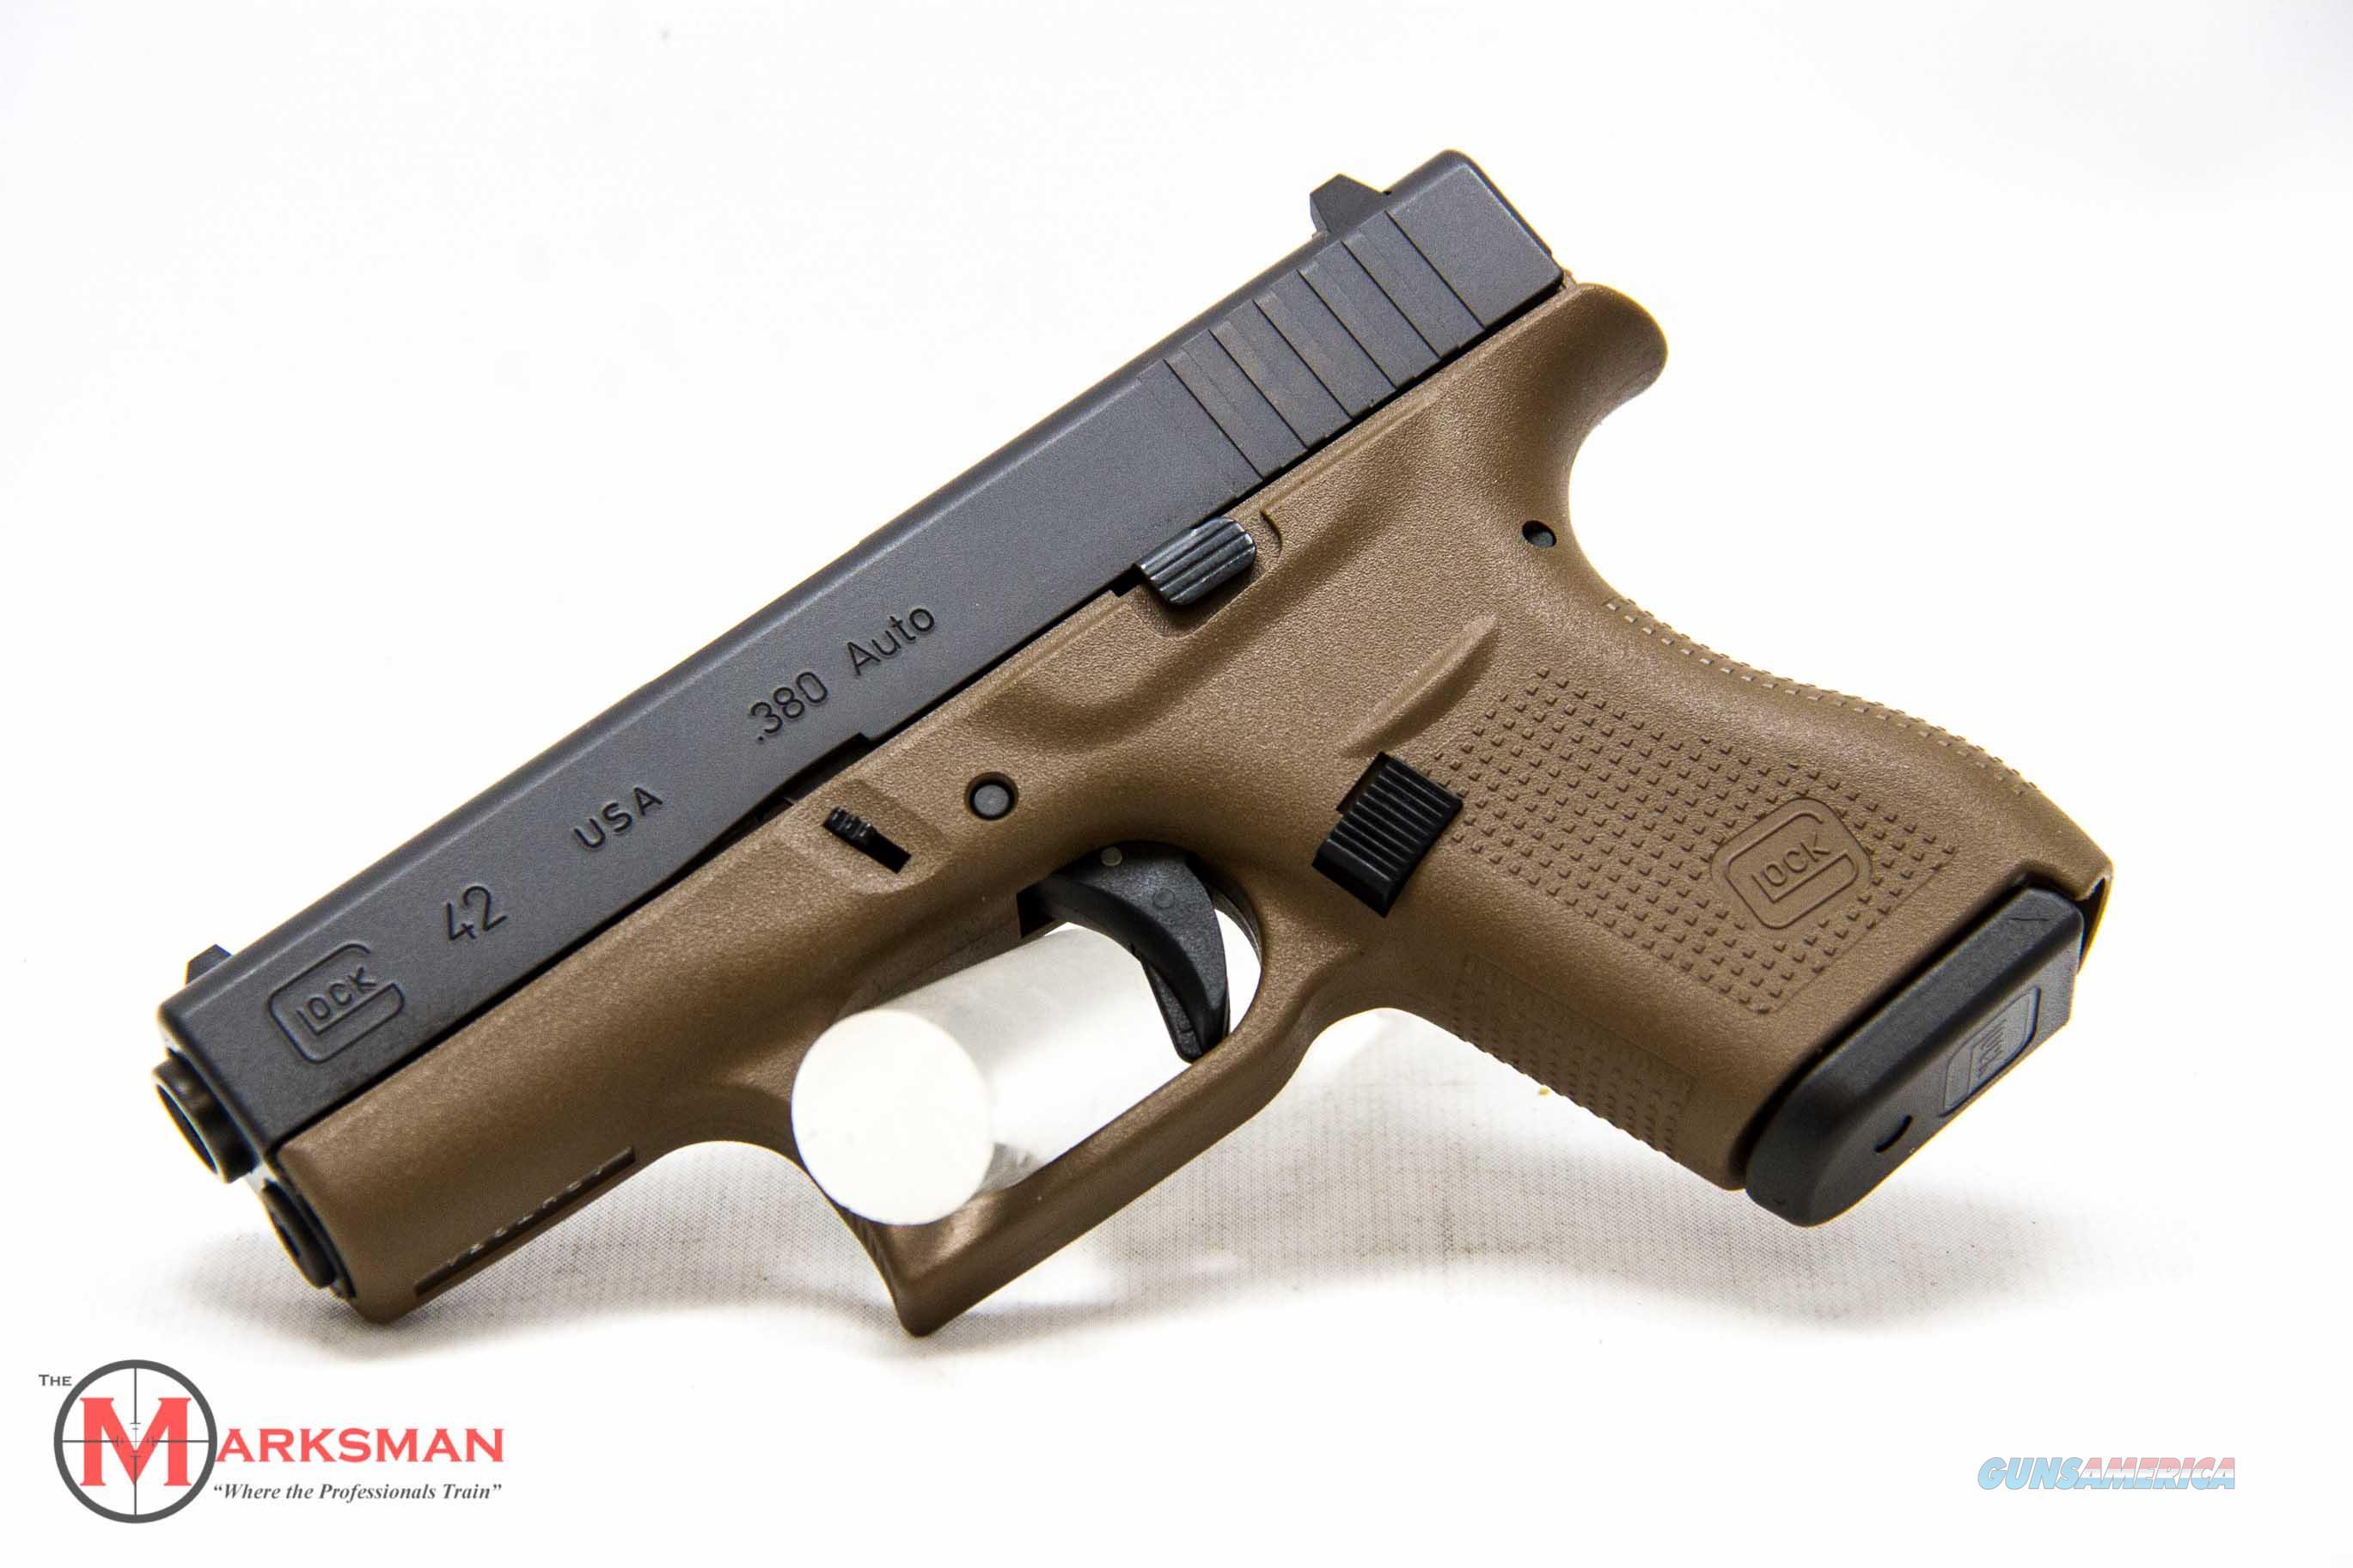 Glock 42 .380 ACP Flat Dark Earth NEW Lipsey's Exclusive  Guns > Pistols > Glock Pistols > 42